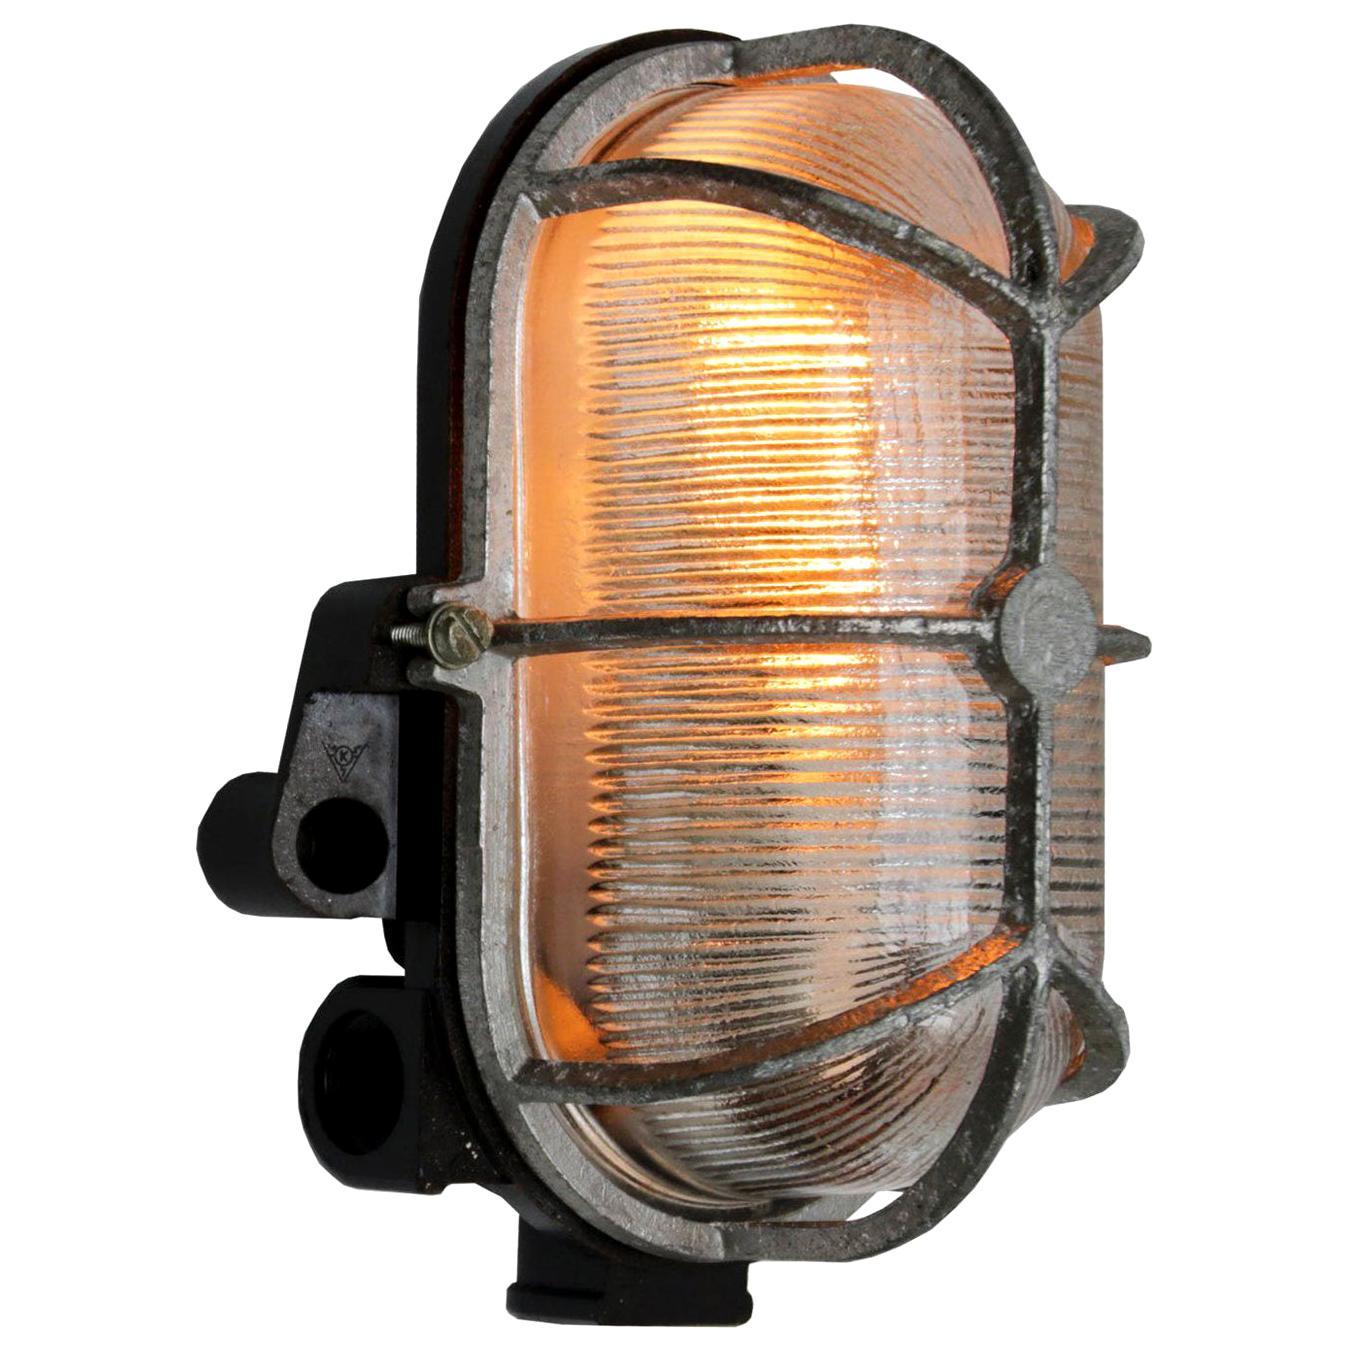 Vintage Industrial Bakelite Holophane Glass Wall Lights Scones